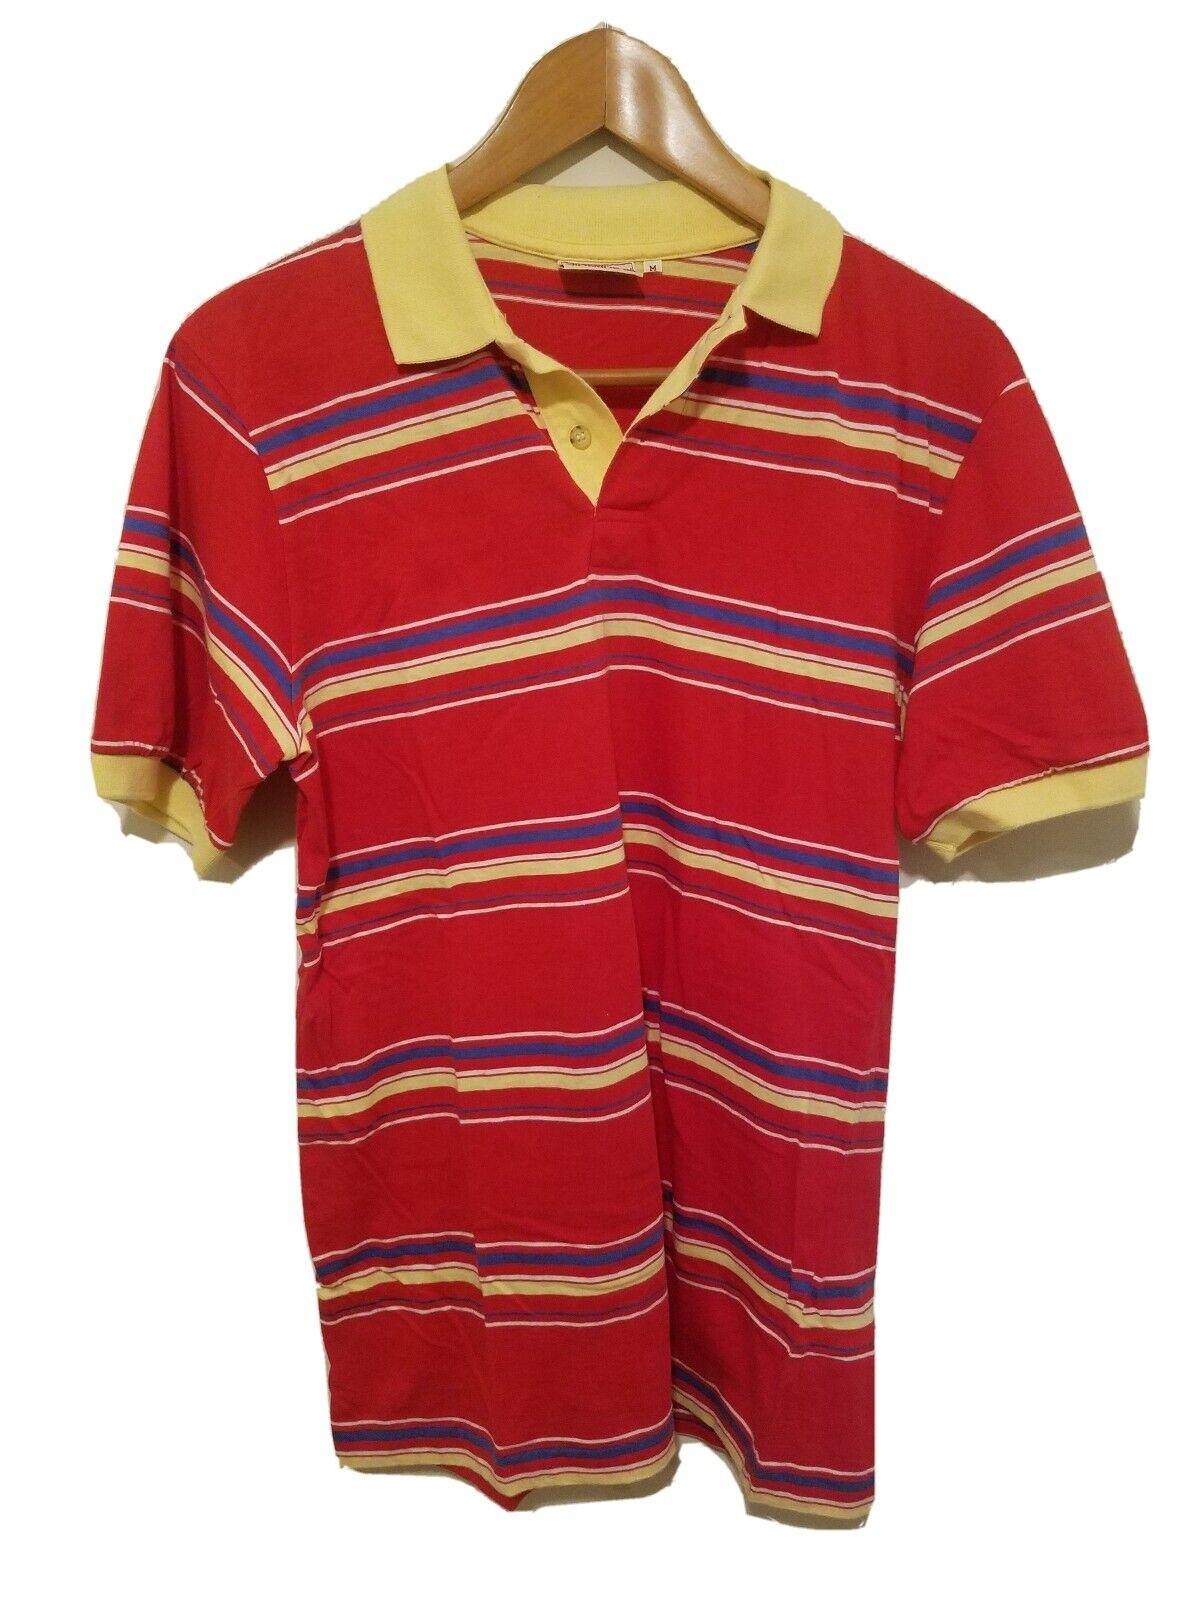 Vintage 1980s Chaps Ralph Lauren Striped Polo Shi… - image 1